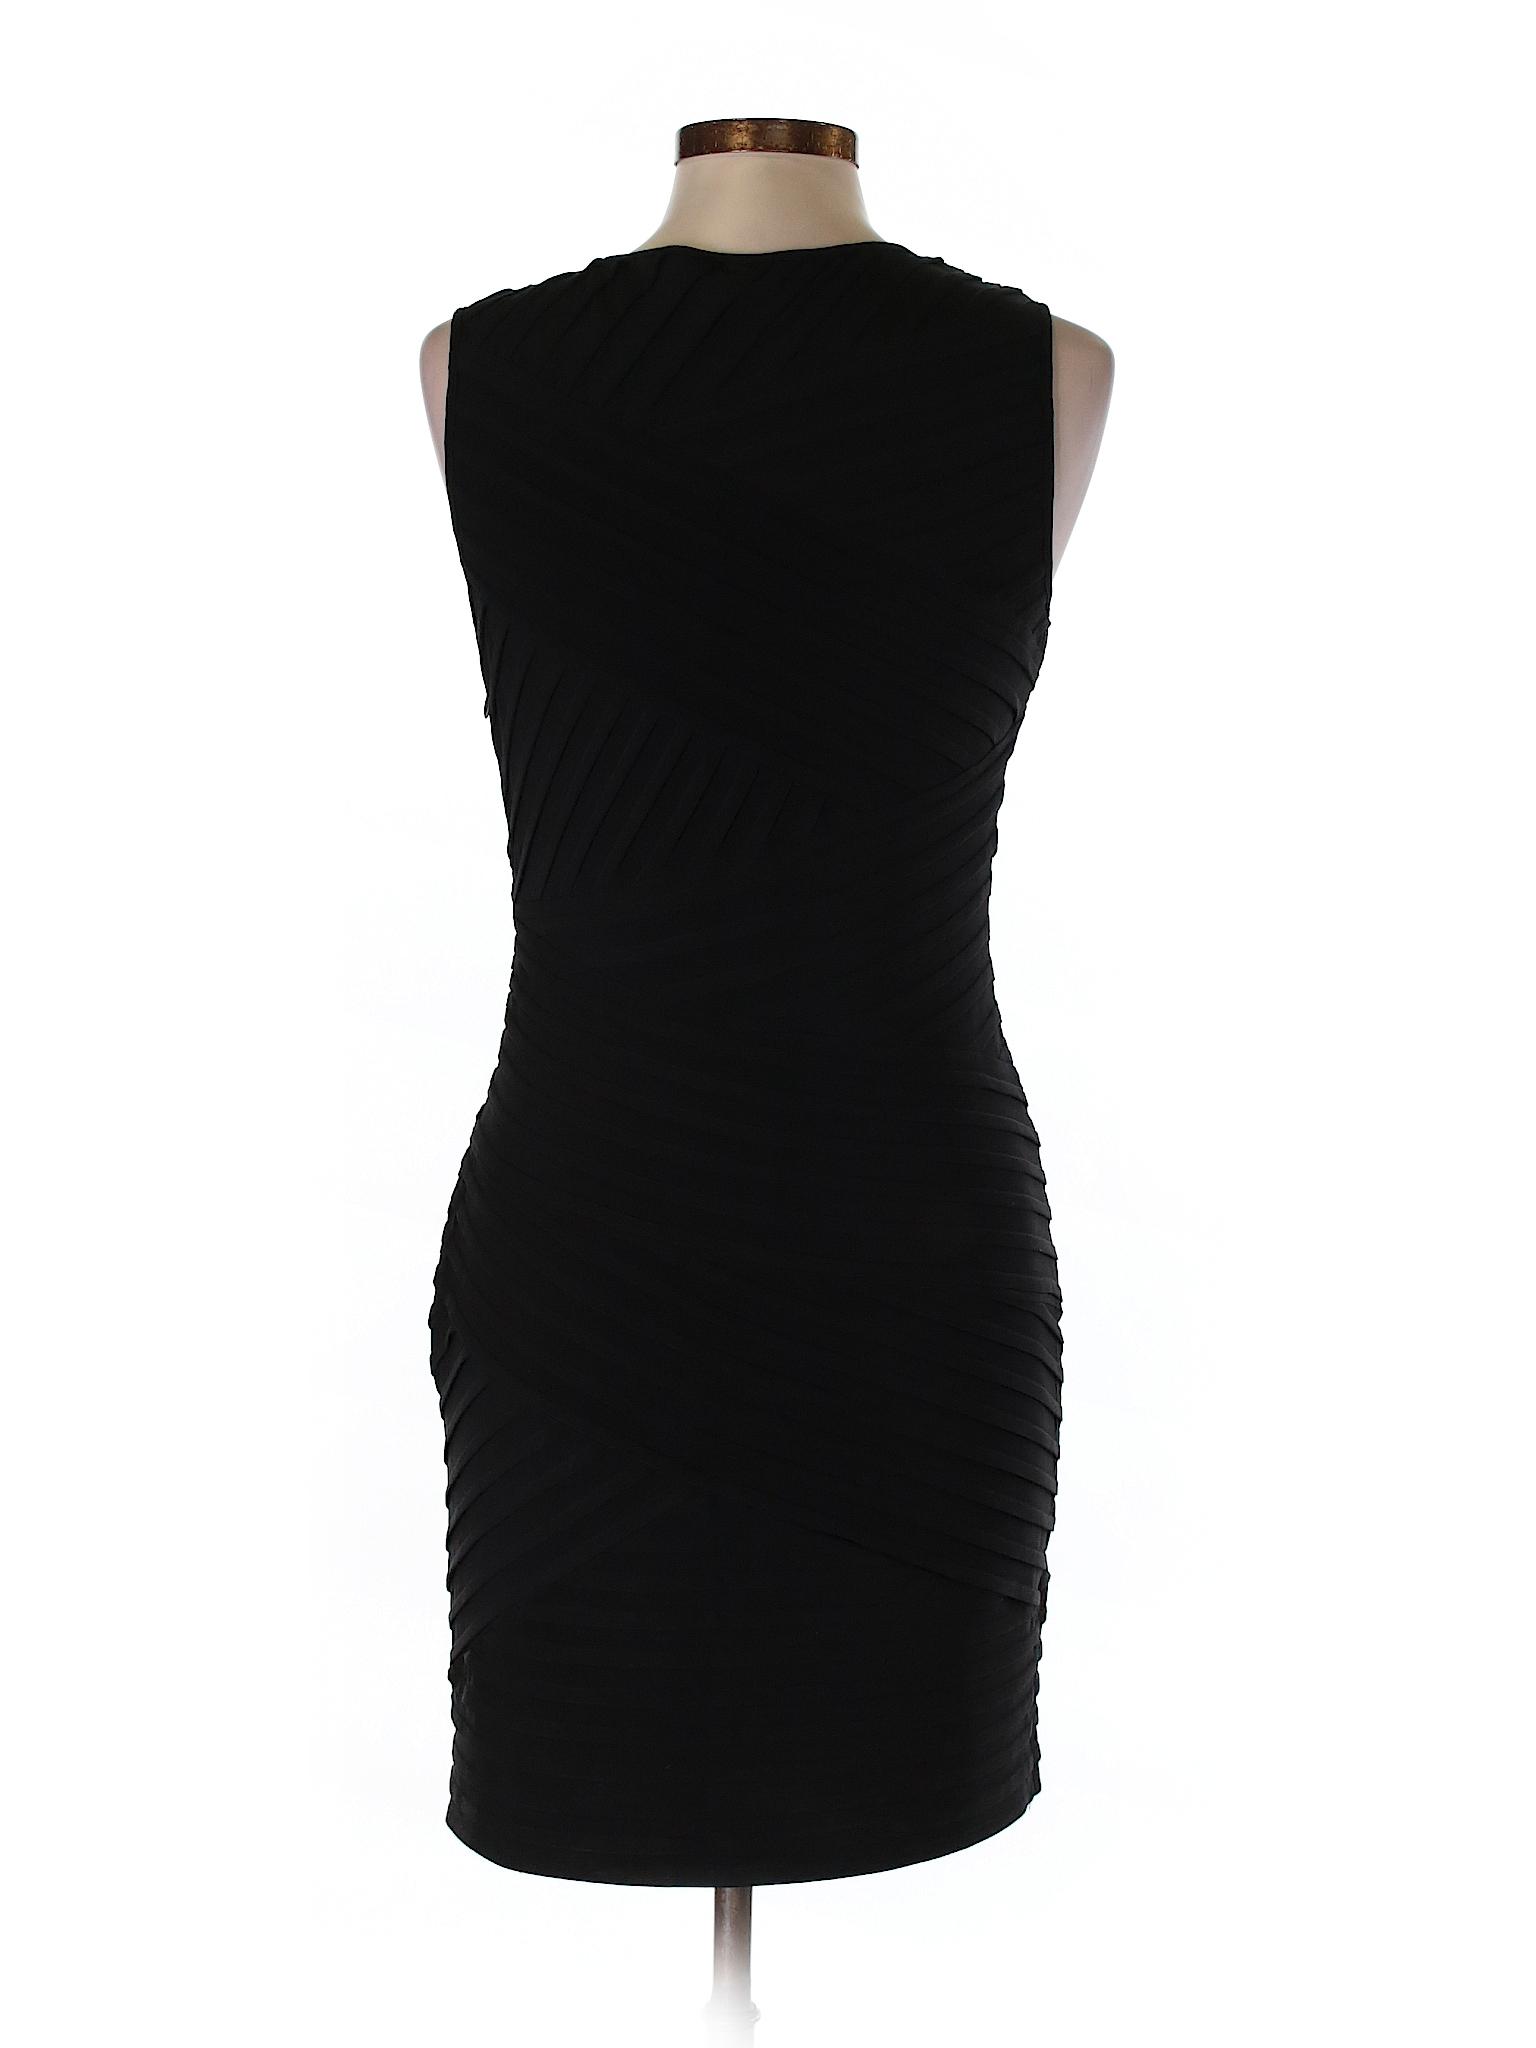 Klein Dress Casual Calvin Calvin Selling Selling 0tw6BPq